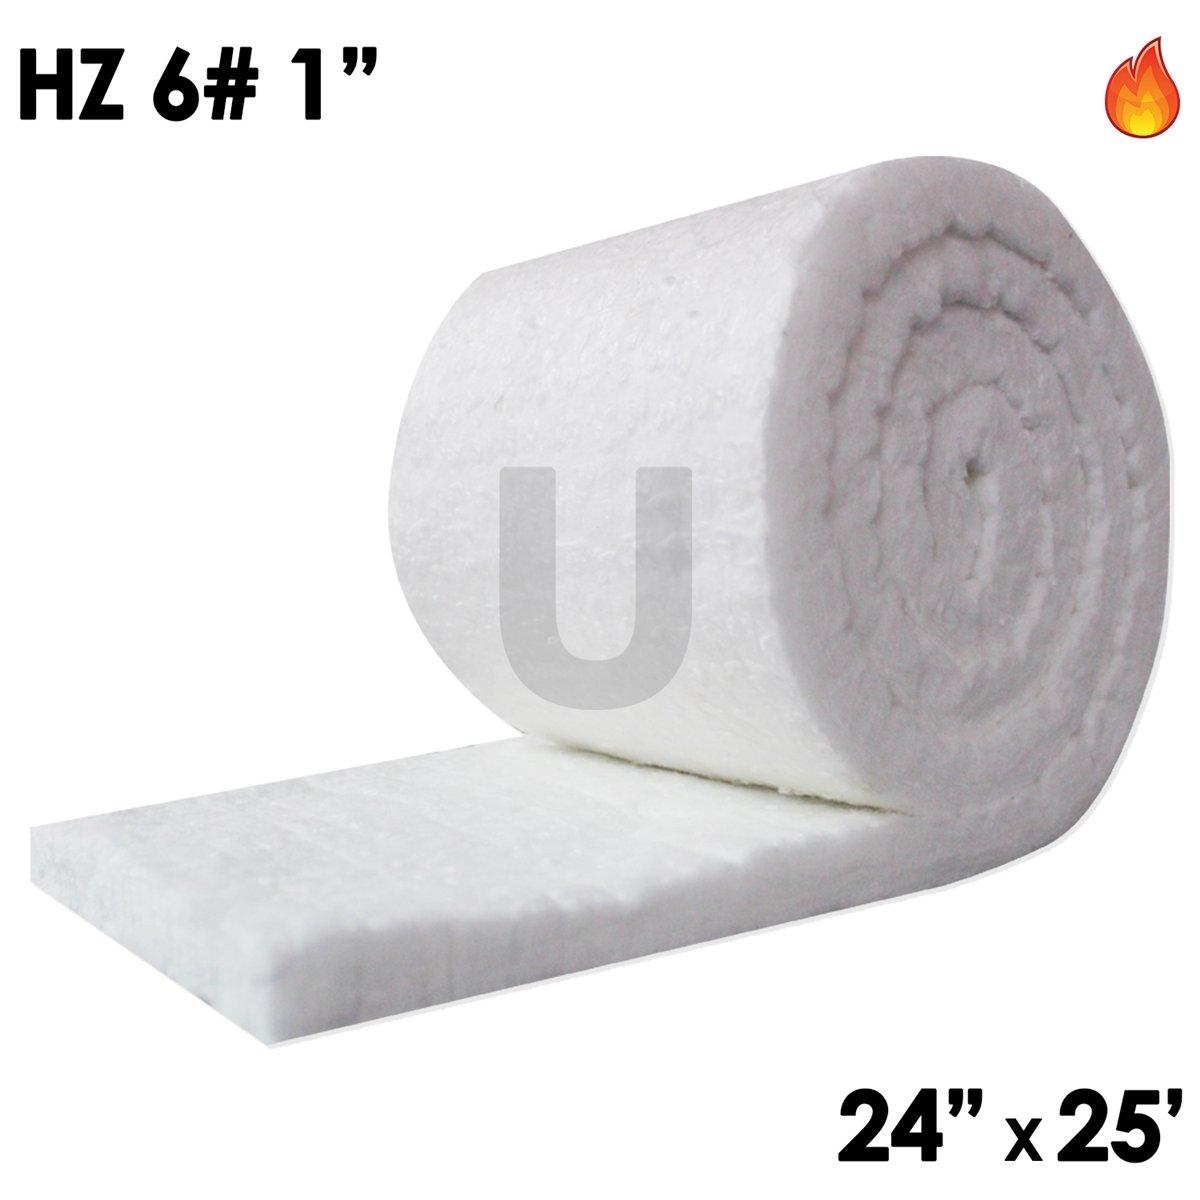 UniTherm Ceramic Fiber Blanket, HZ, 6lb, 1